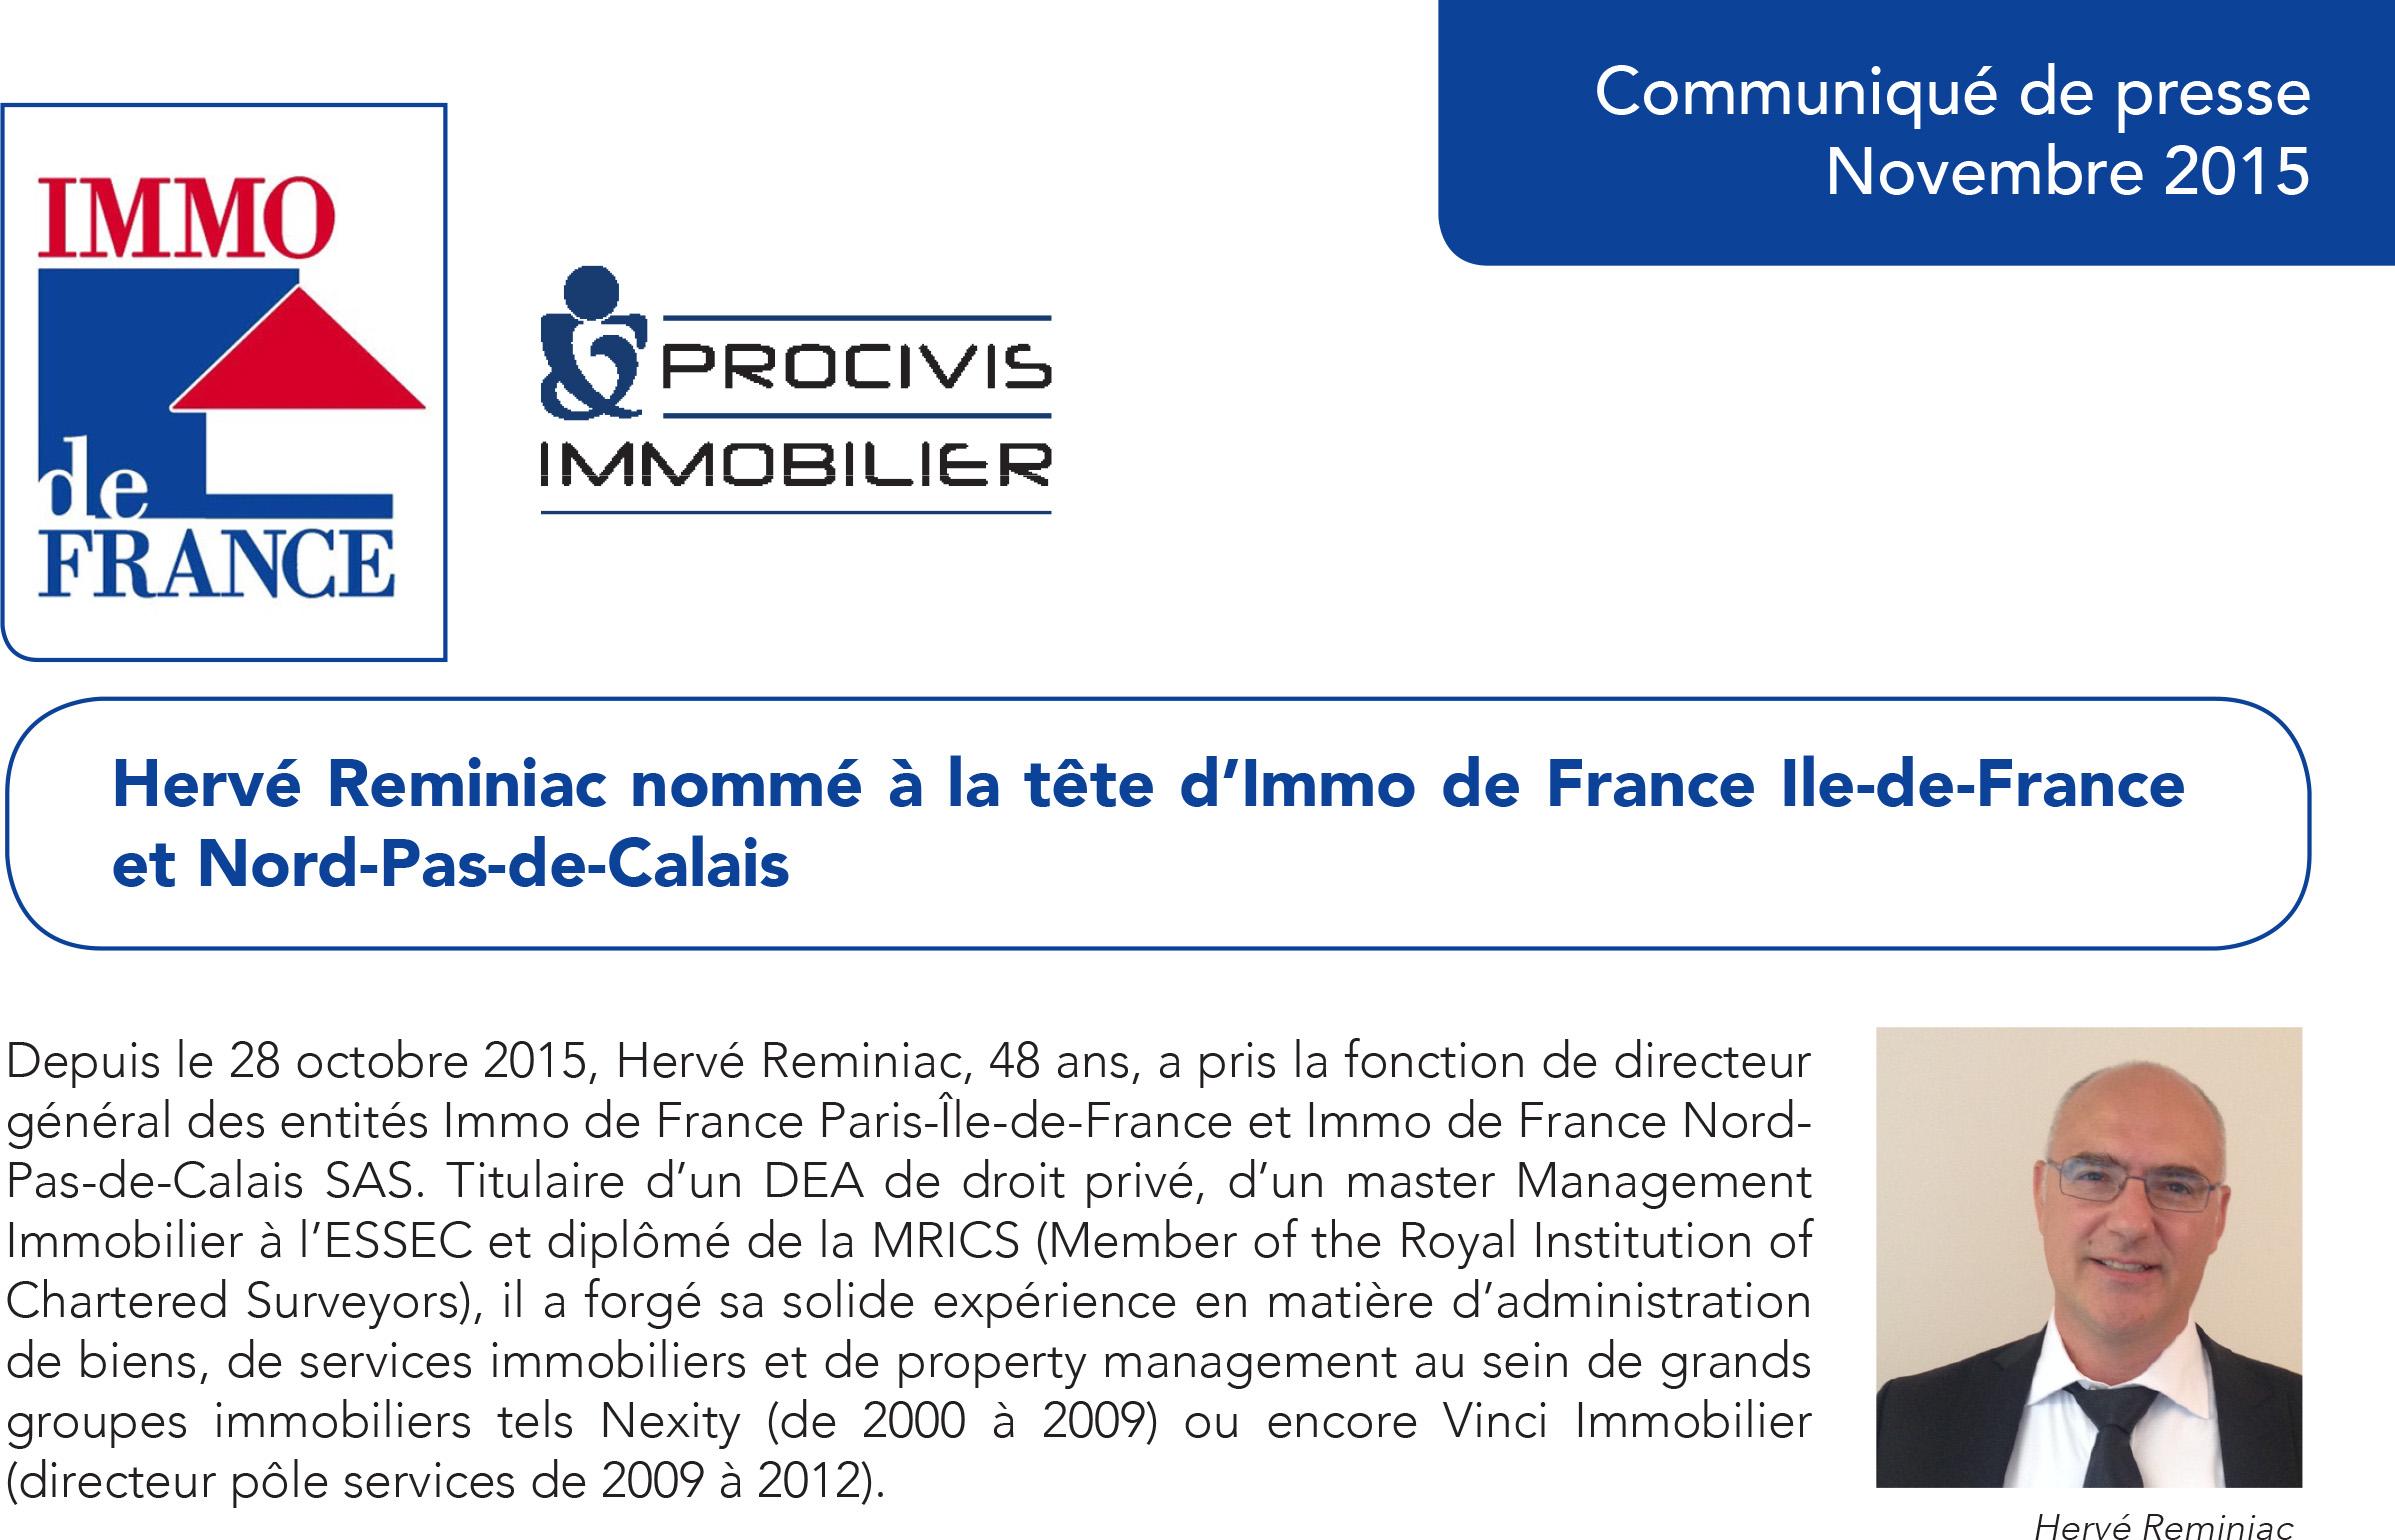 procivis IMMO DE FRANCE hervé reminiac